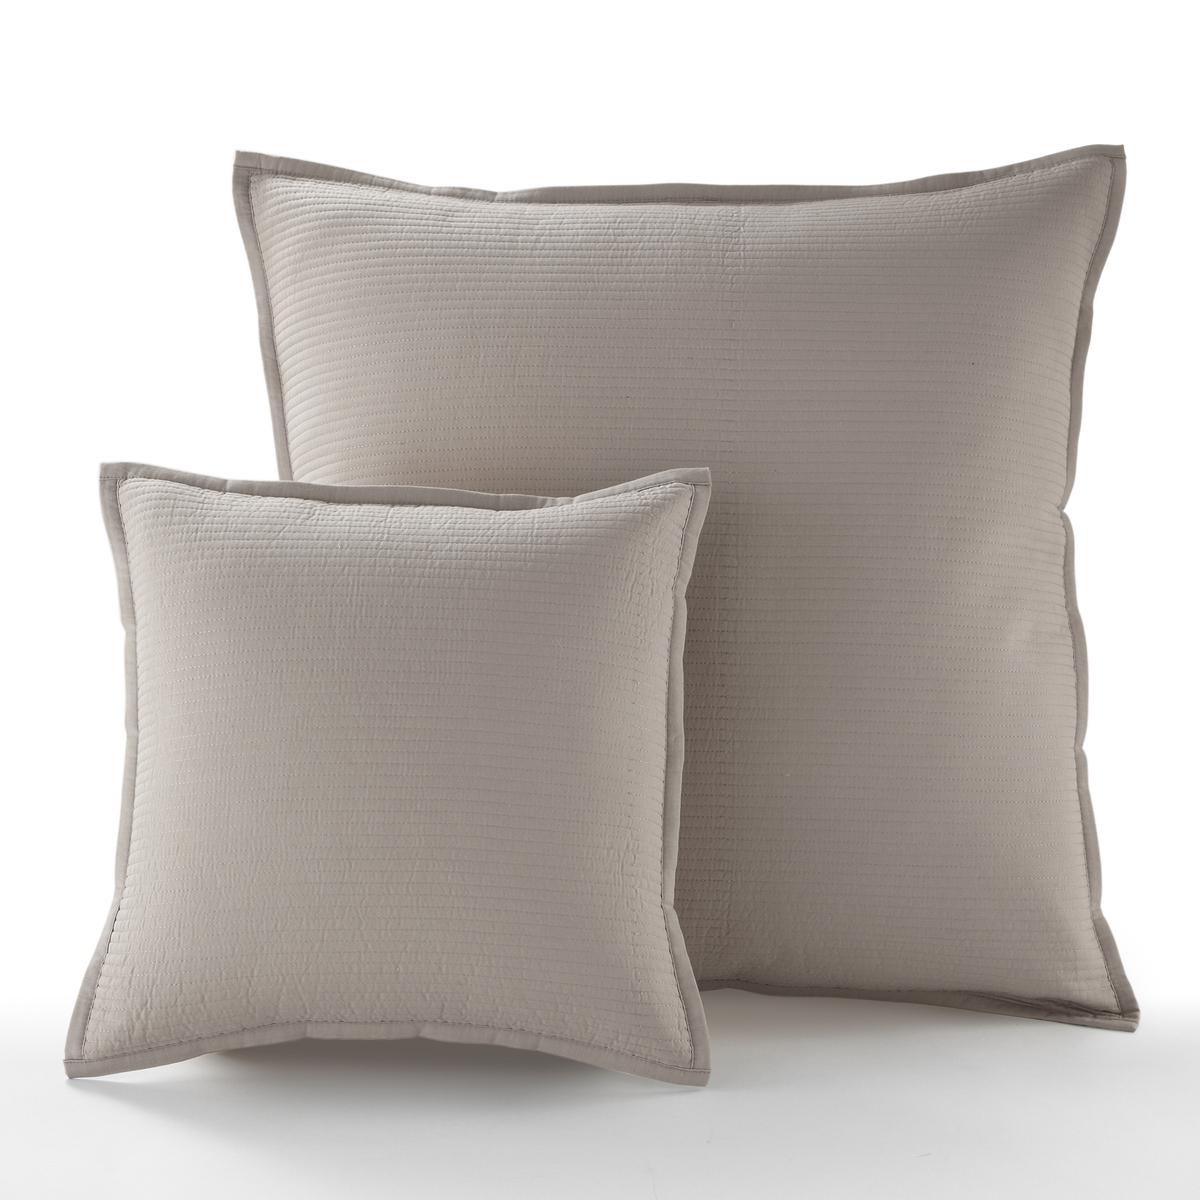 Наволочка на подушку-валик или наволочка BETTA наволочка на подушку валик или подушку jara